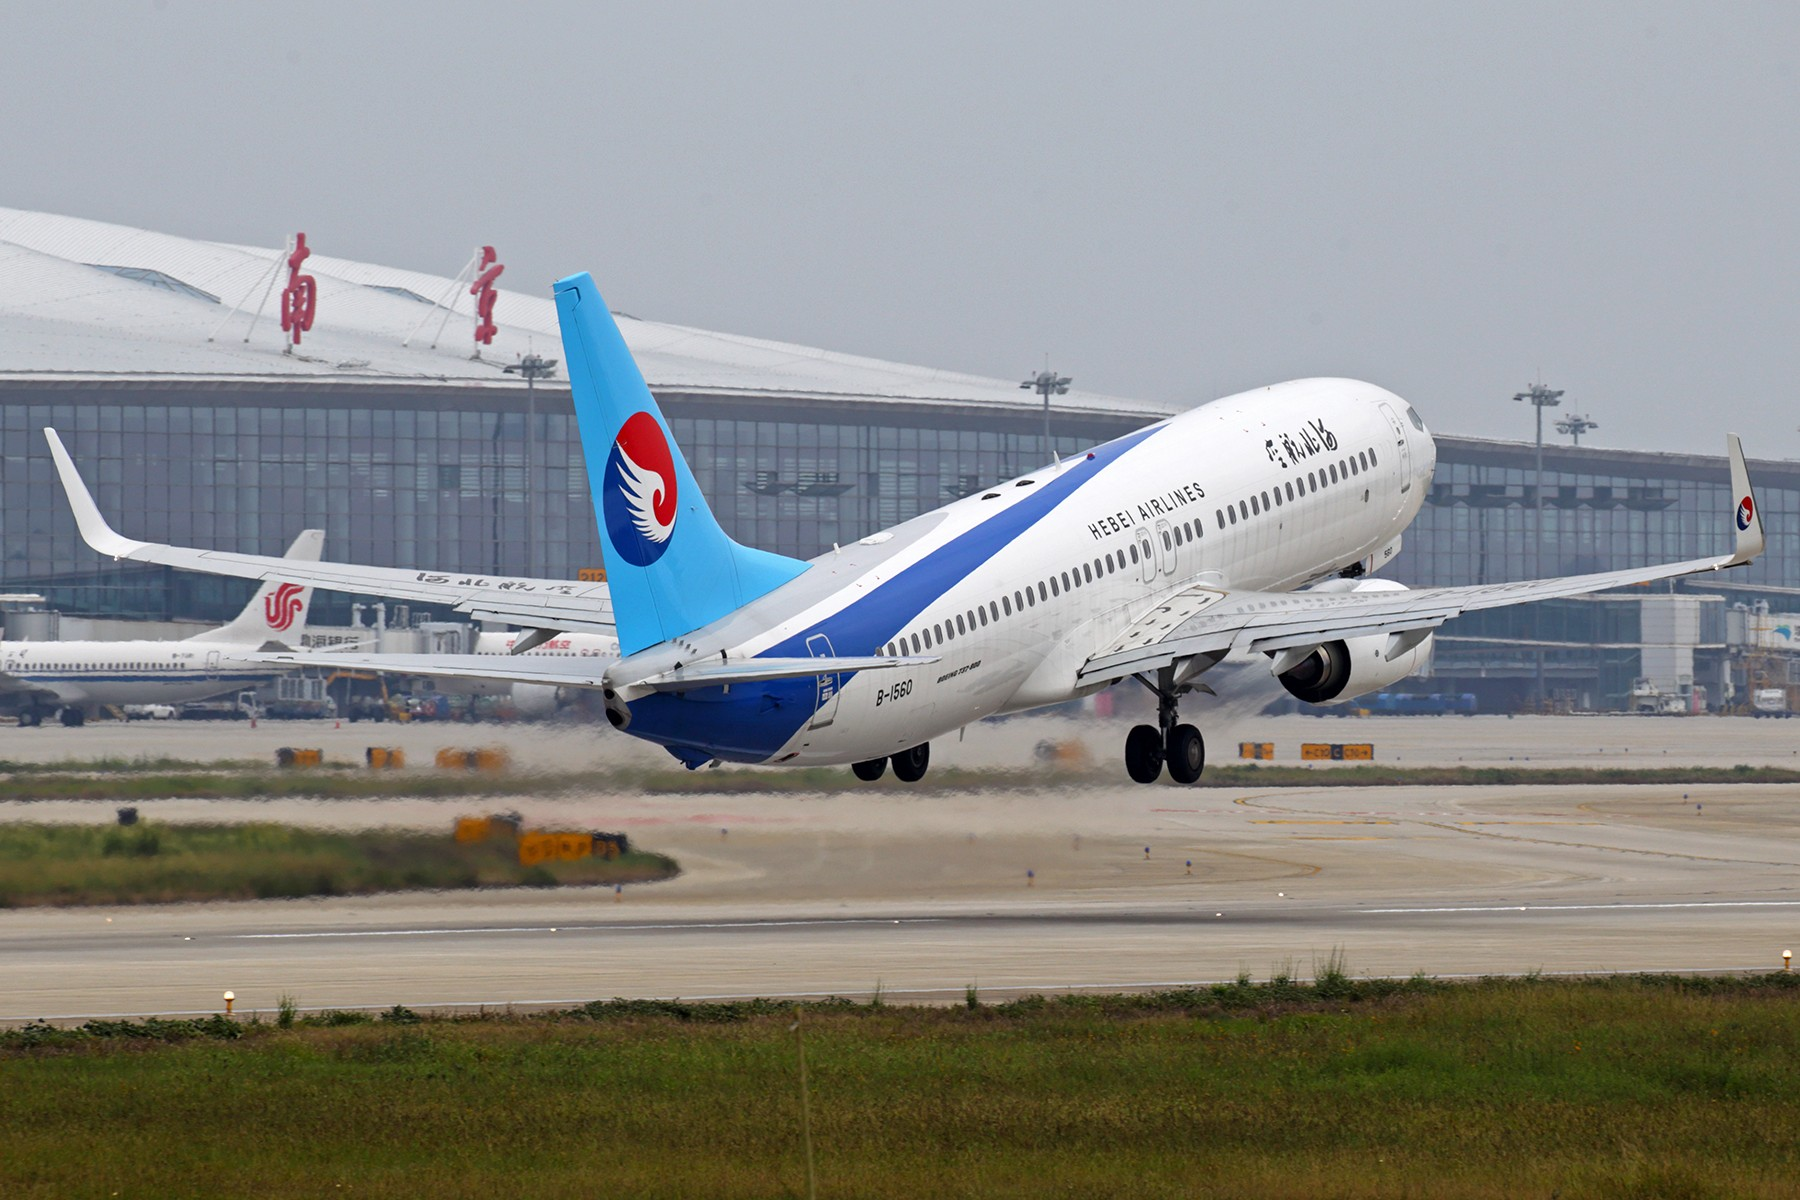 Re:[原创]【BLDDQ】******NKG07/25单跑道运行中****** BOEING 737-800 B-1560 中国南京禄口国际机场